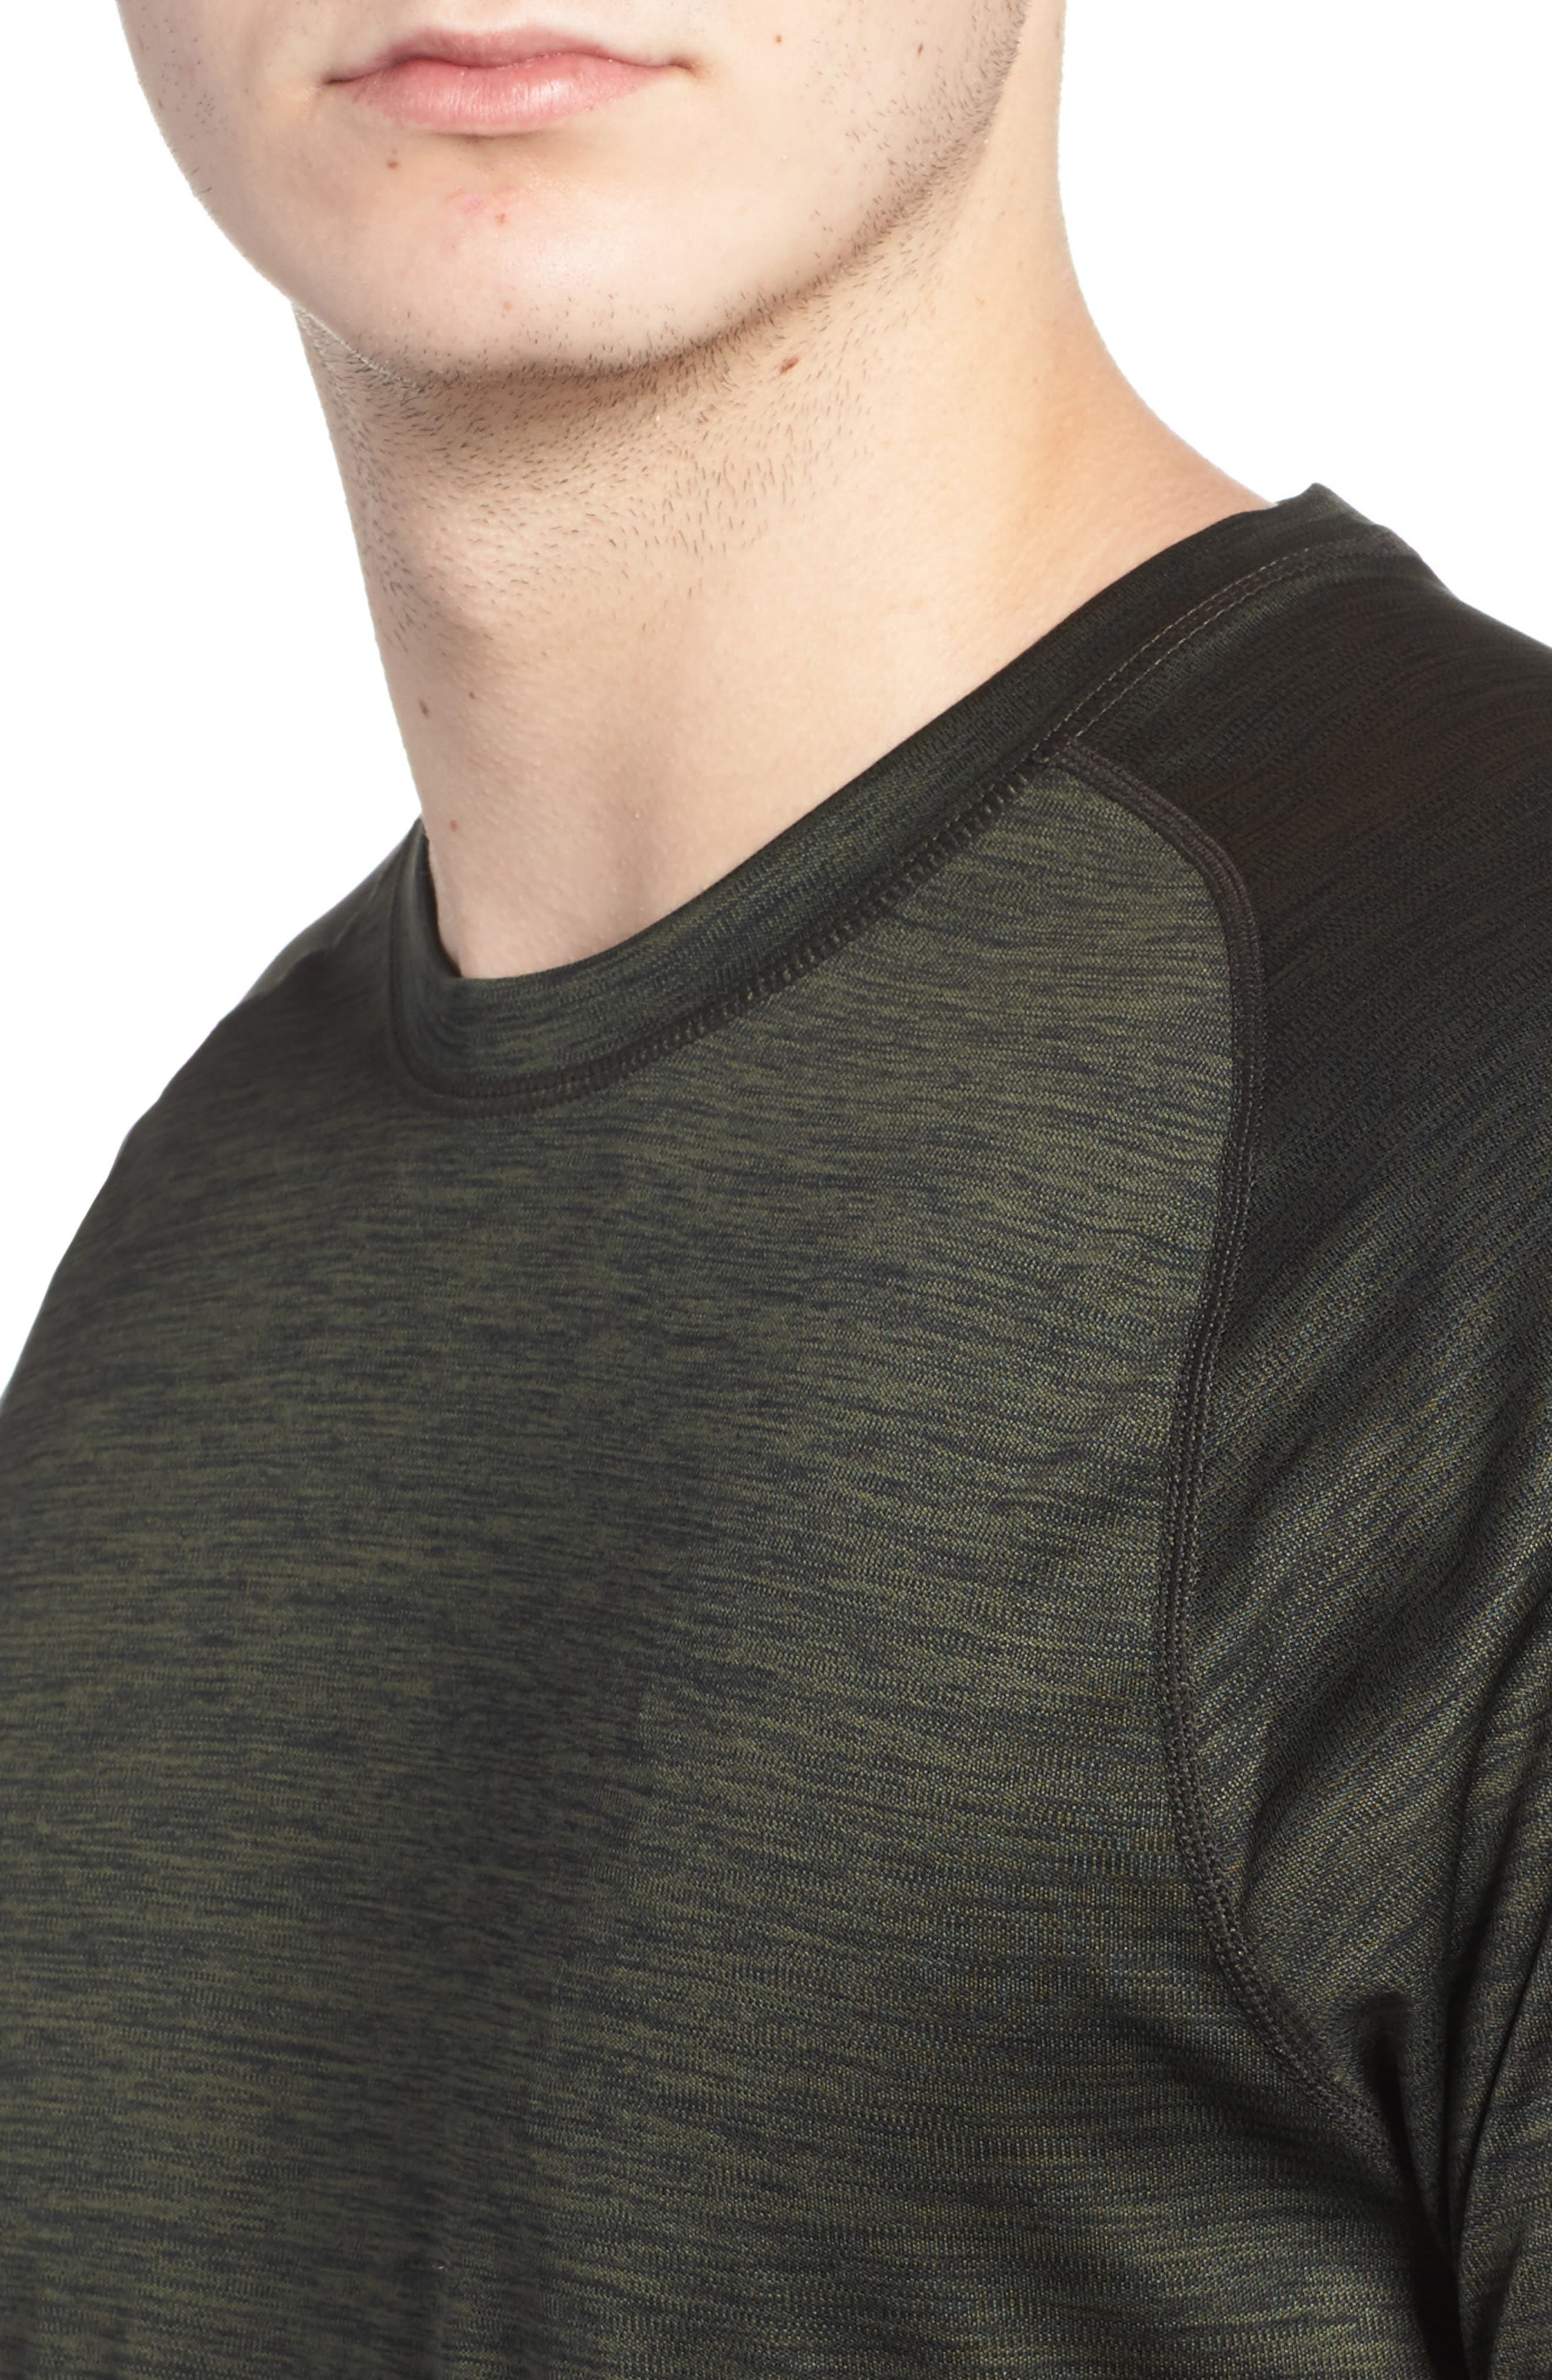 Triplite T-Shirt,                             Alternate thumbnail 41, color,